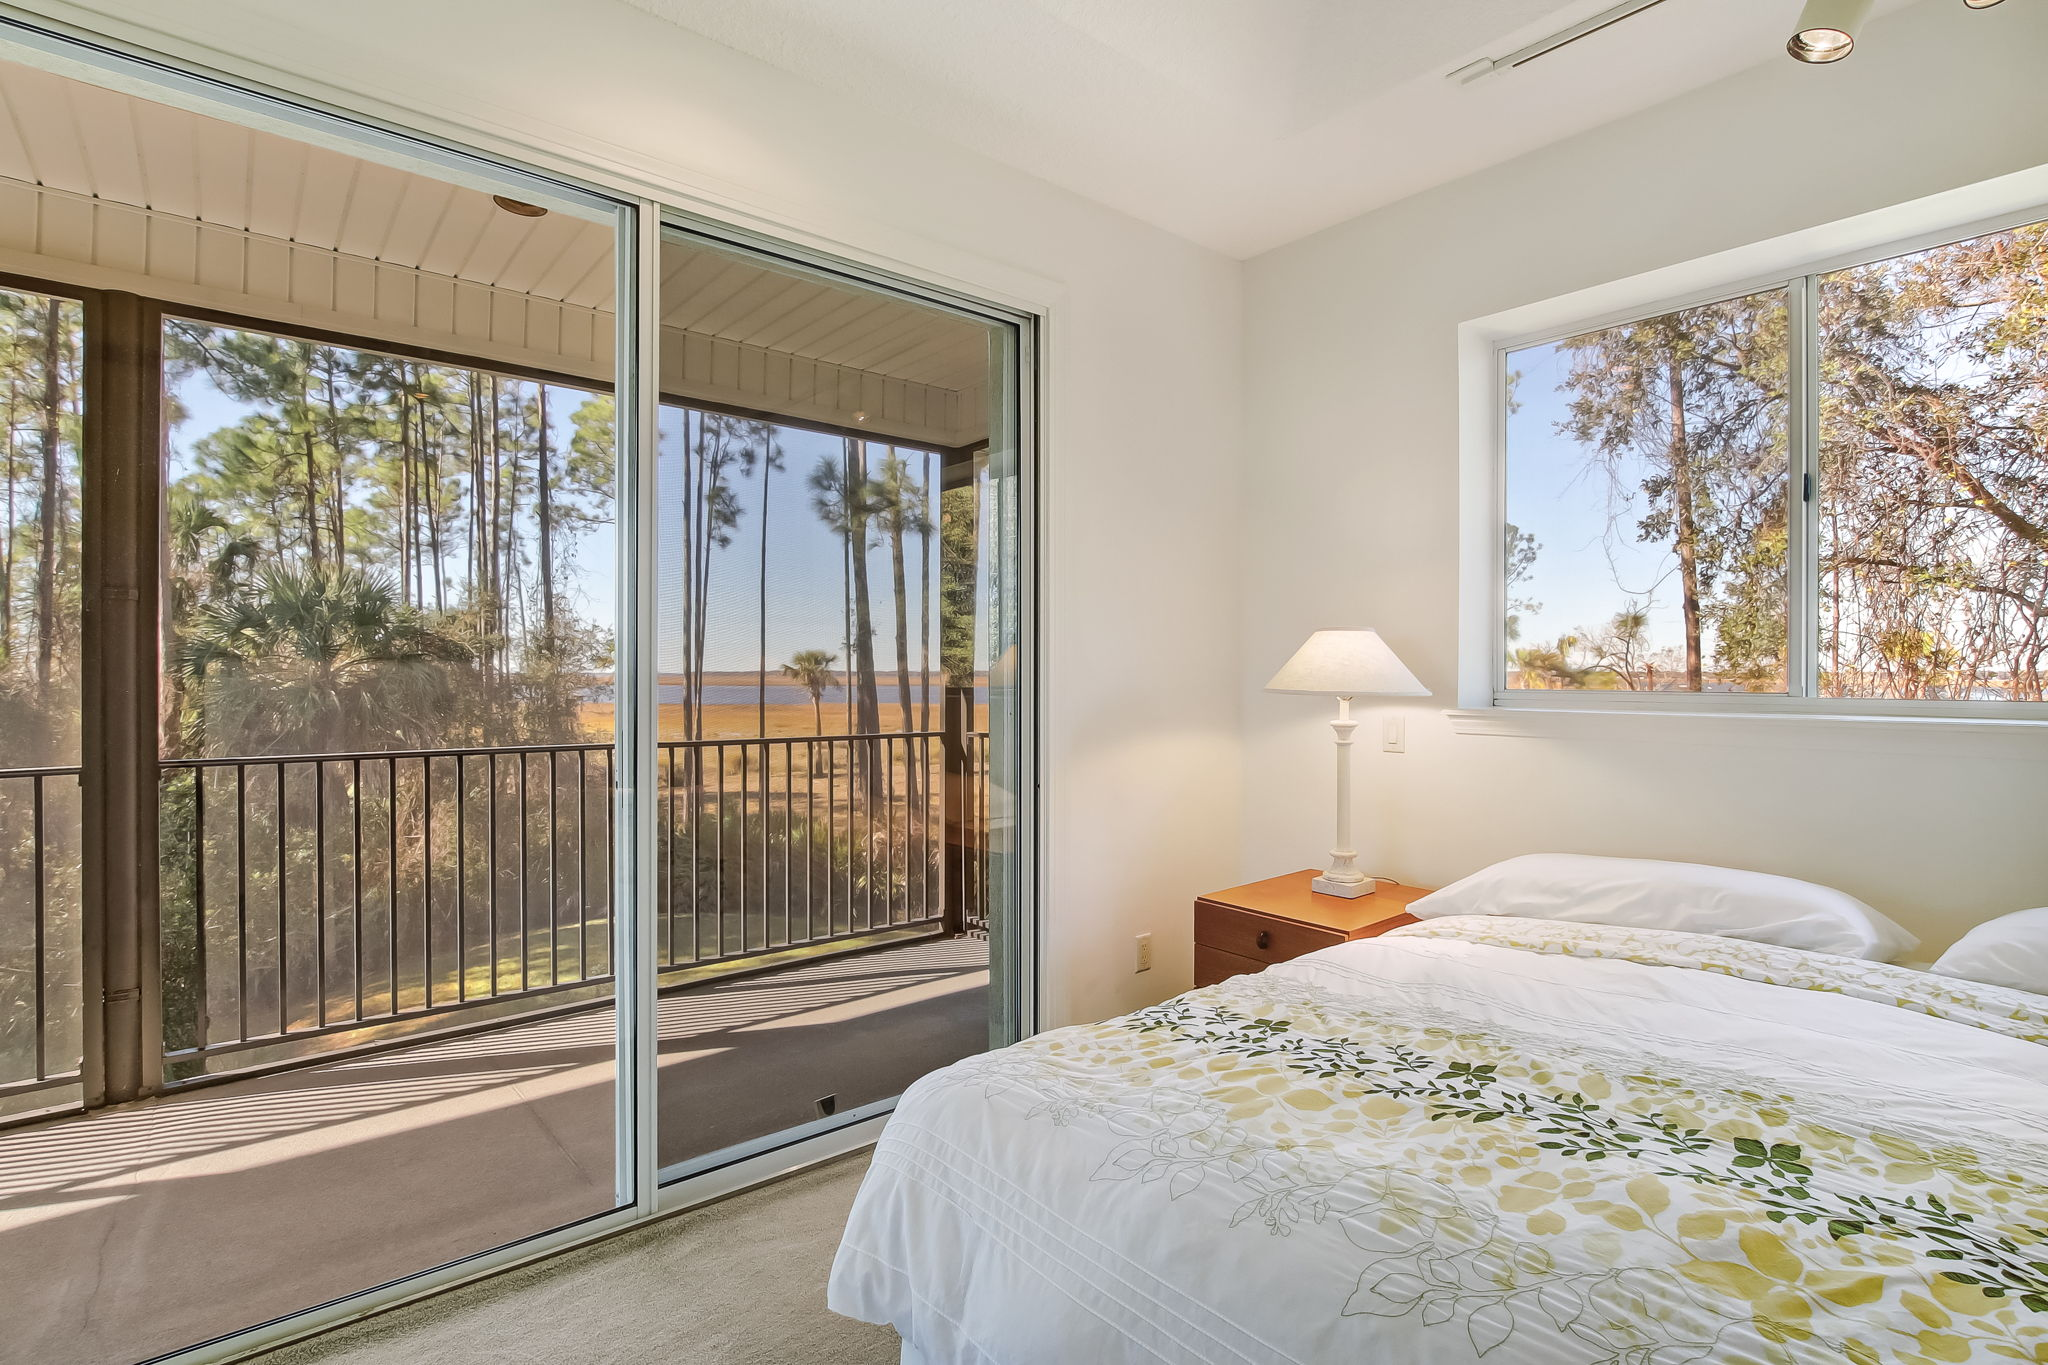 Primary Bedroom with amazing views